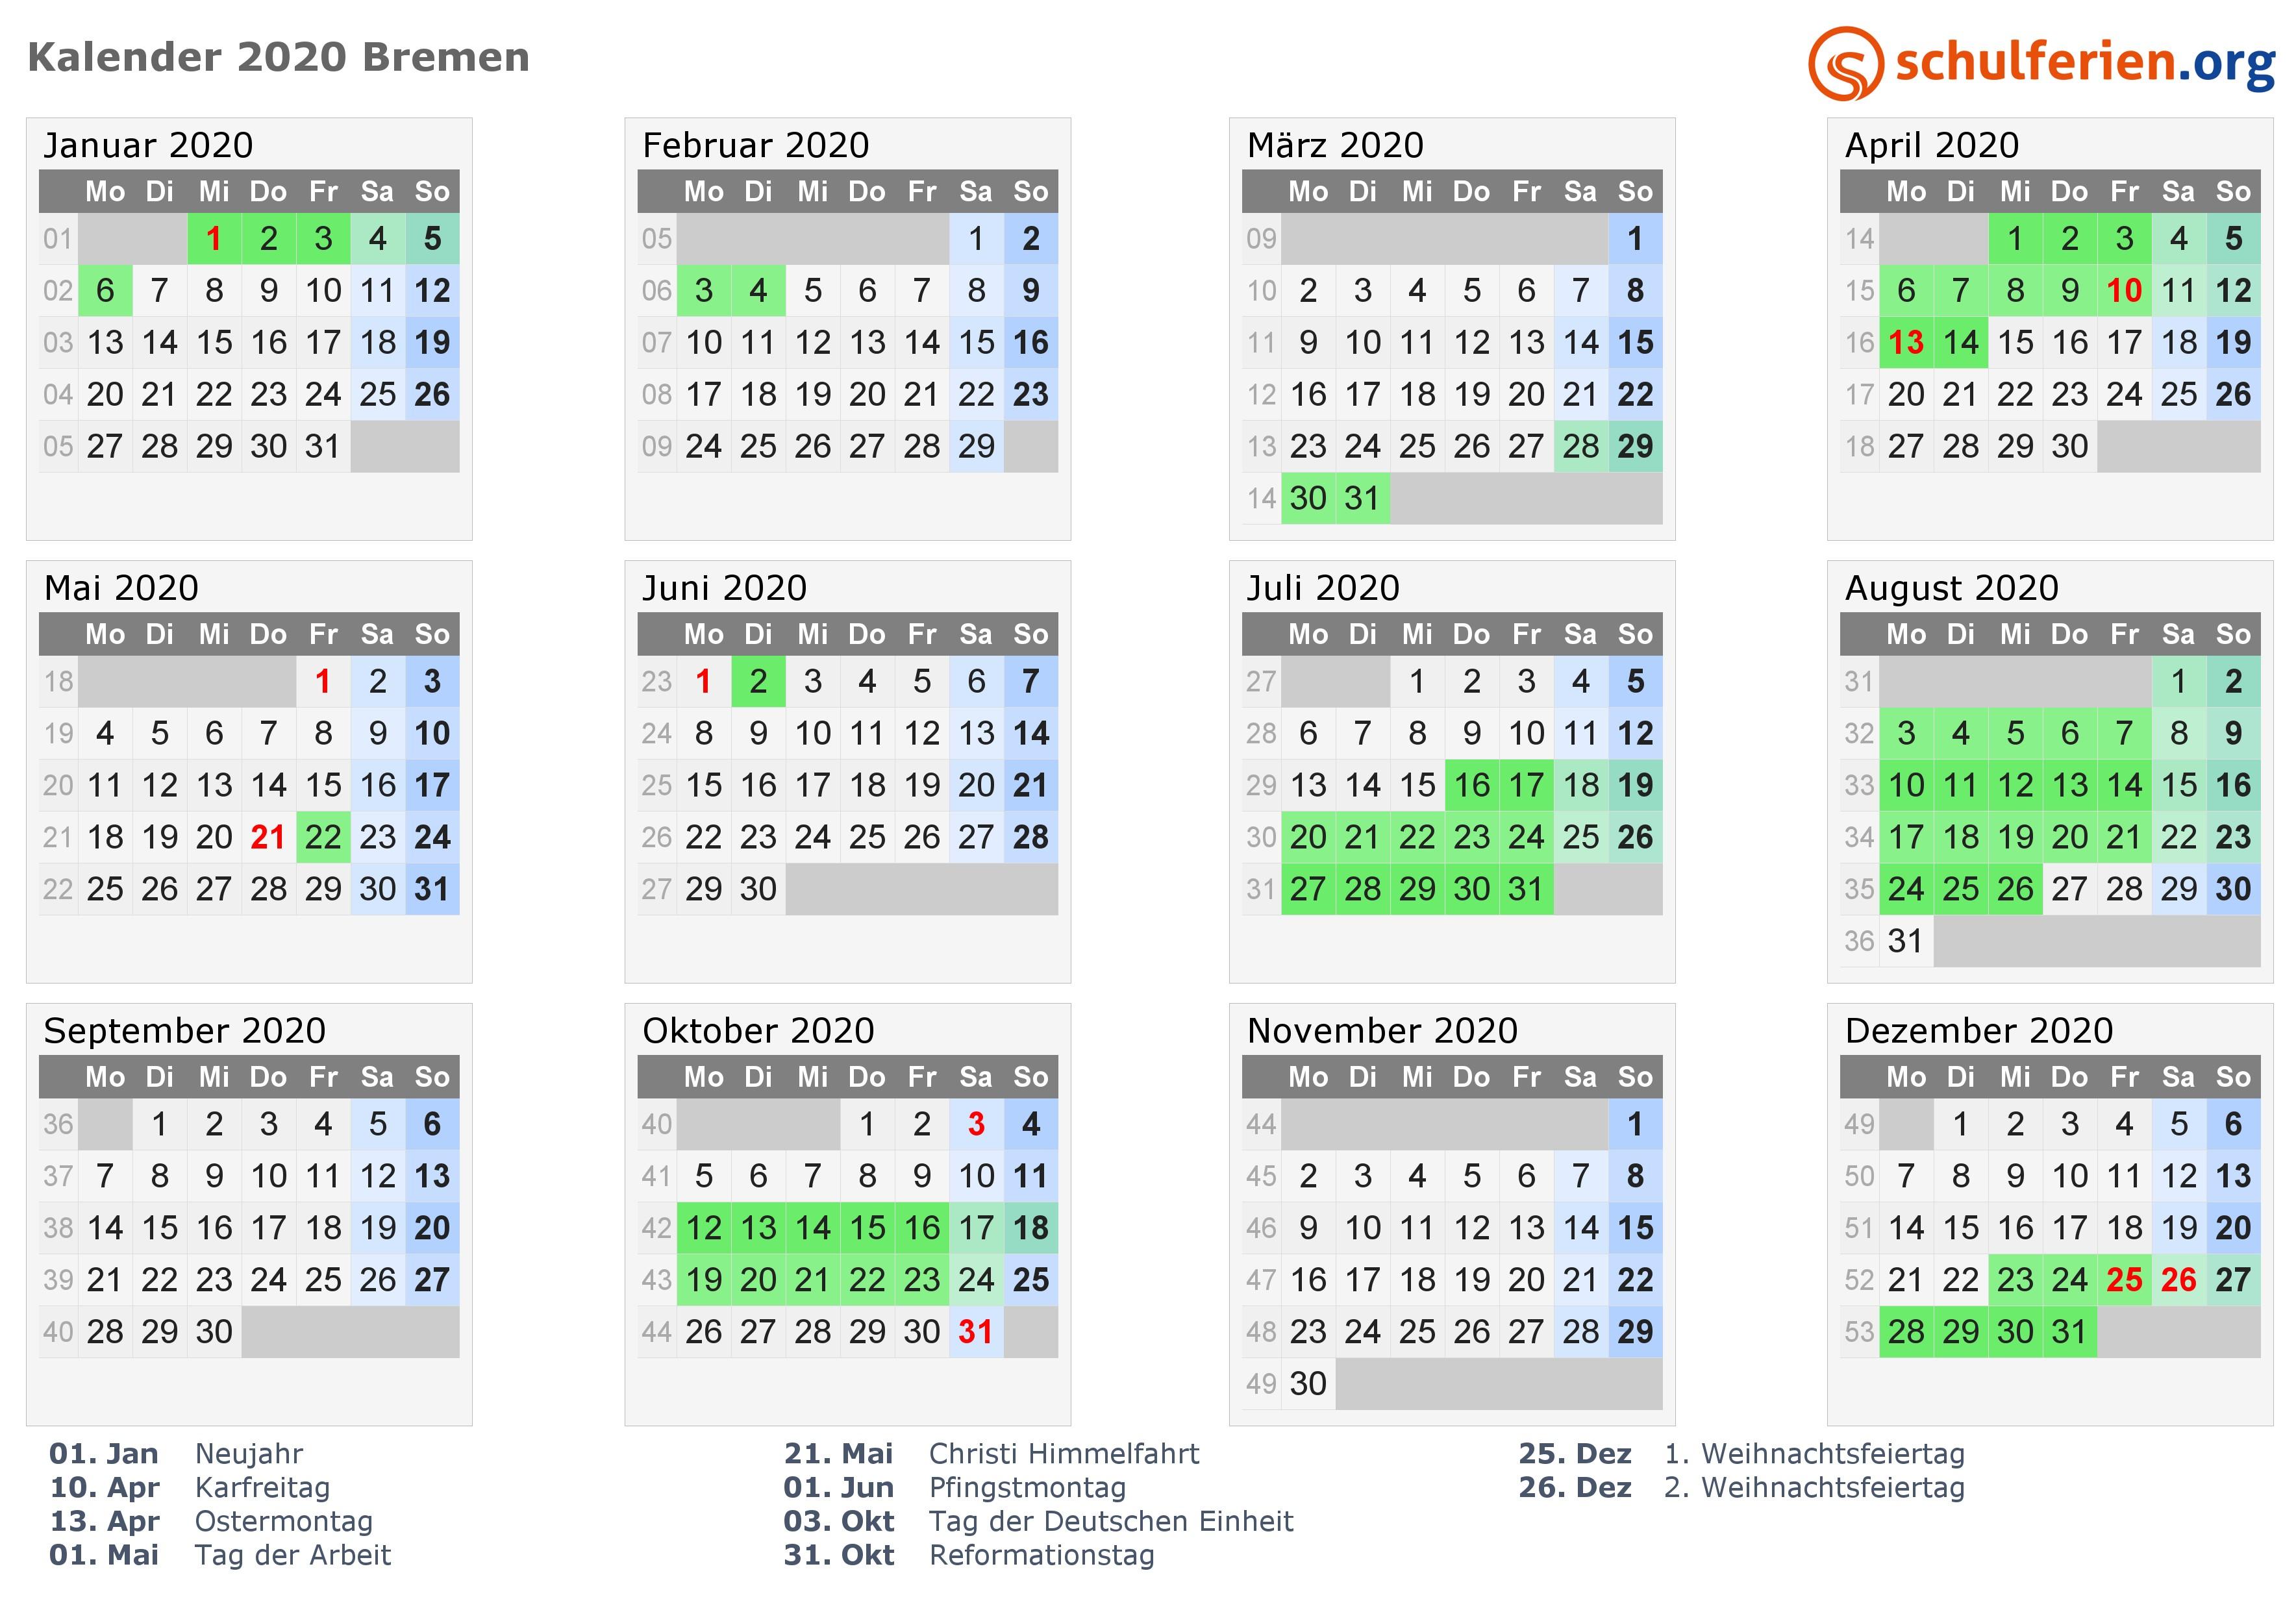 kalender 2020 bremen quer